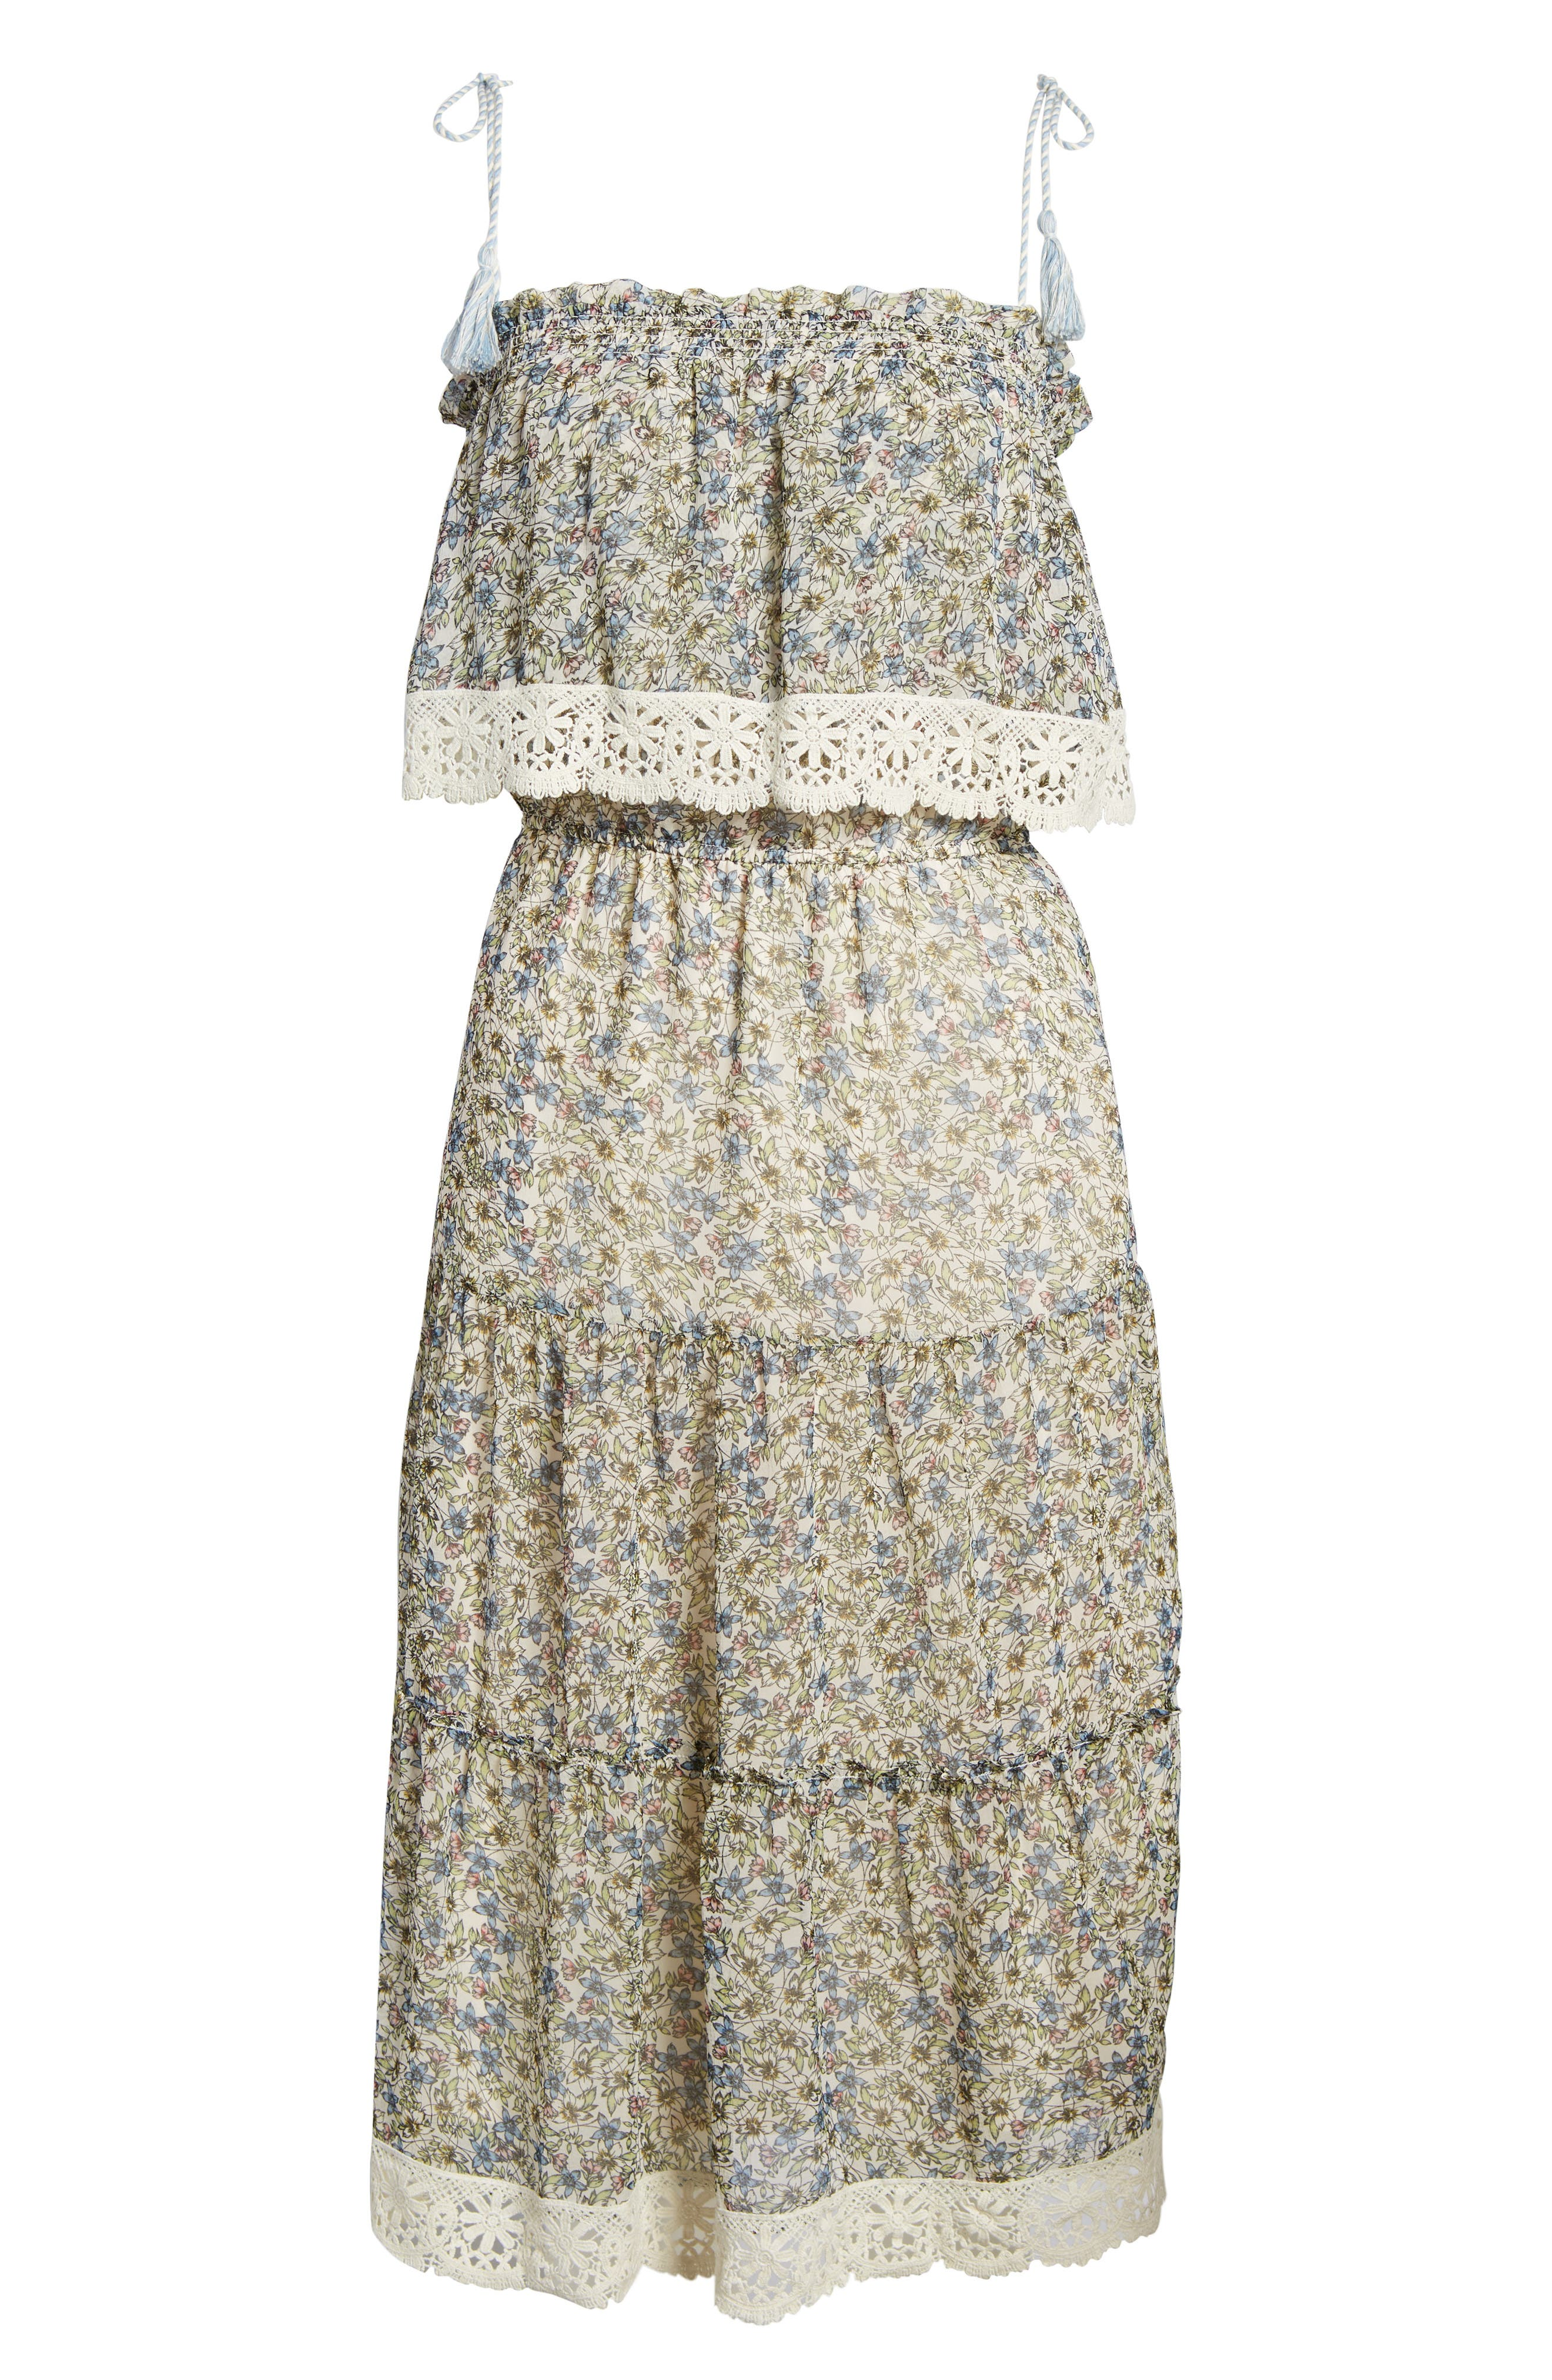 Deda Popover Dress,                             Alternate thumbnail 6, color,                             Oatmeal